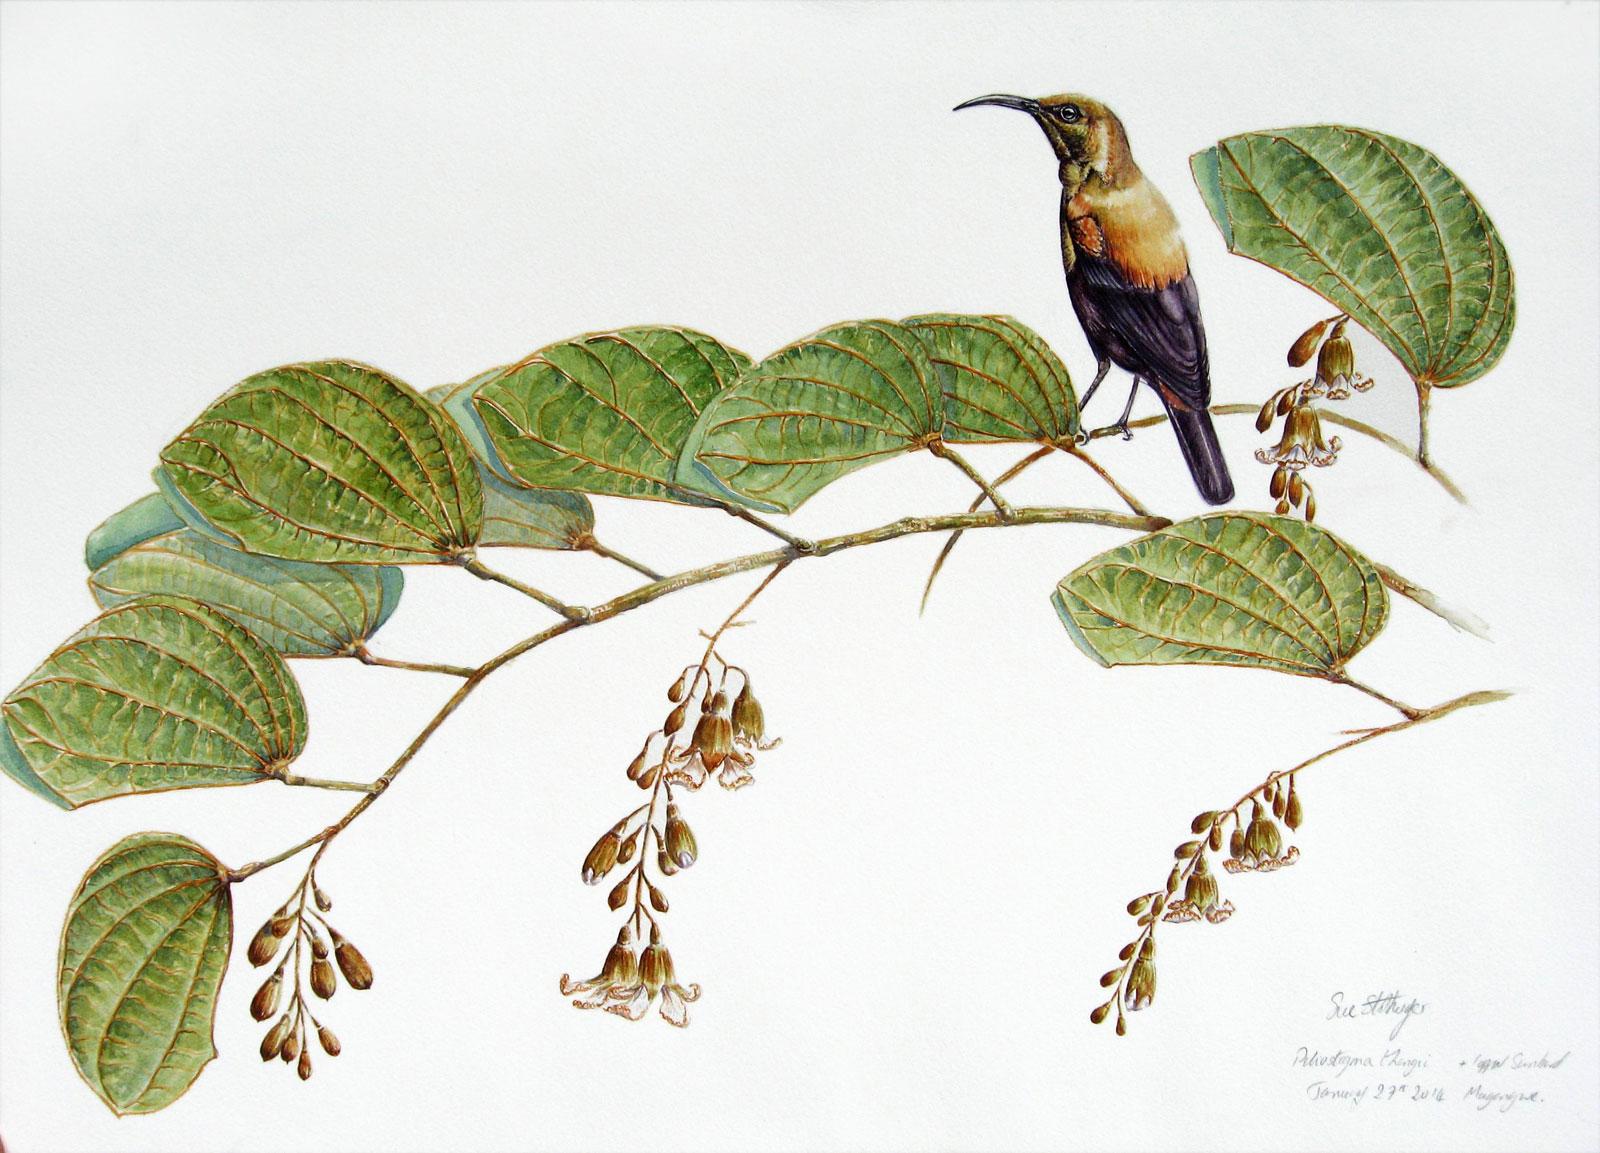 Watercolour-of-copper-sunbird-and-piliostigma-thoningii